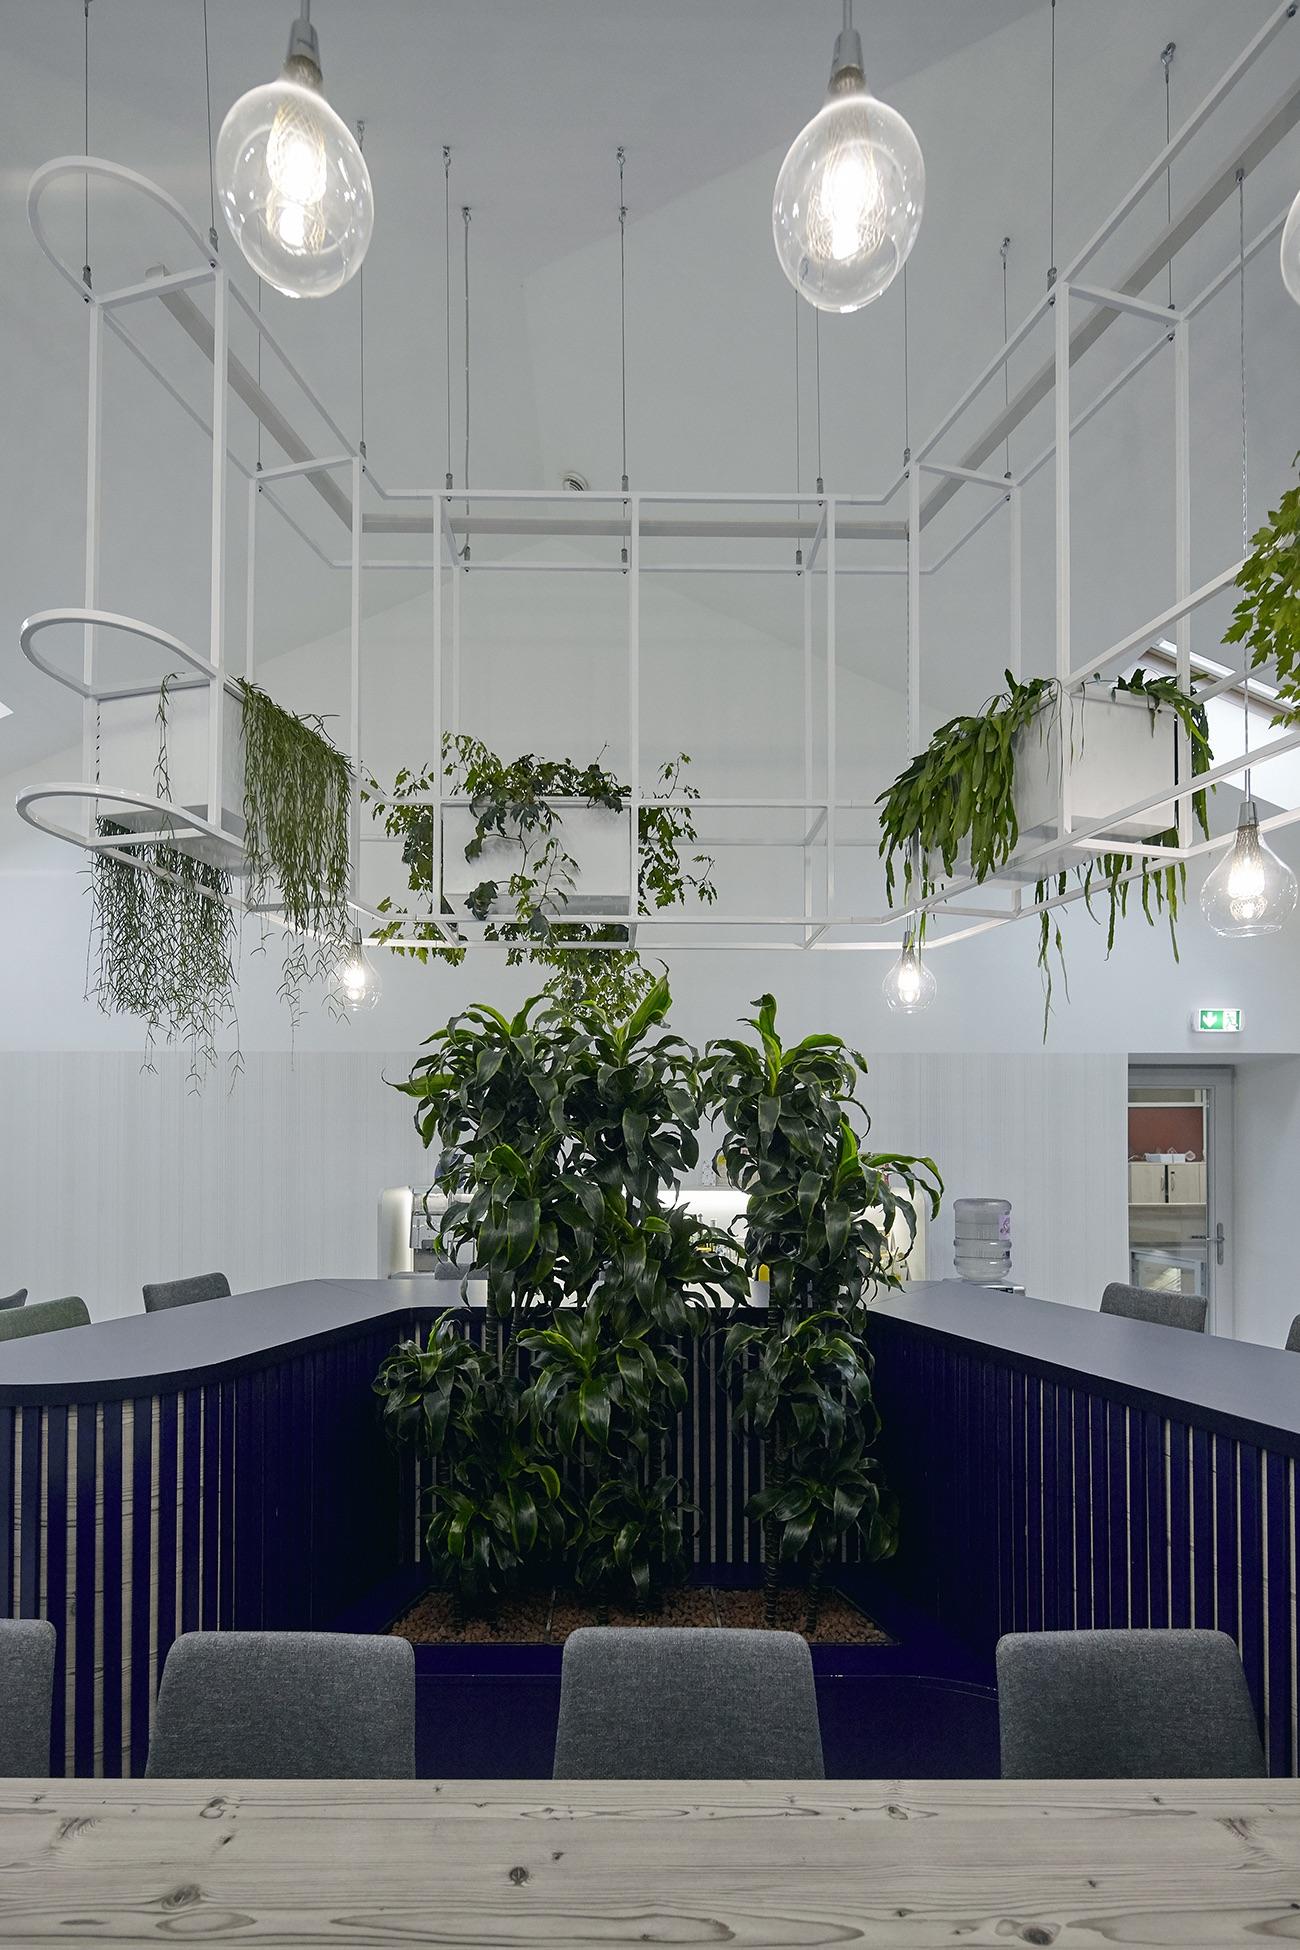 wing-zrt-office-12